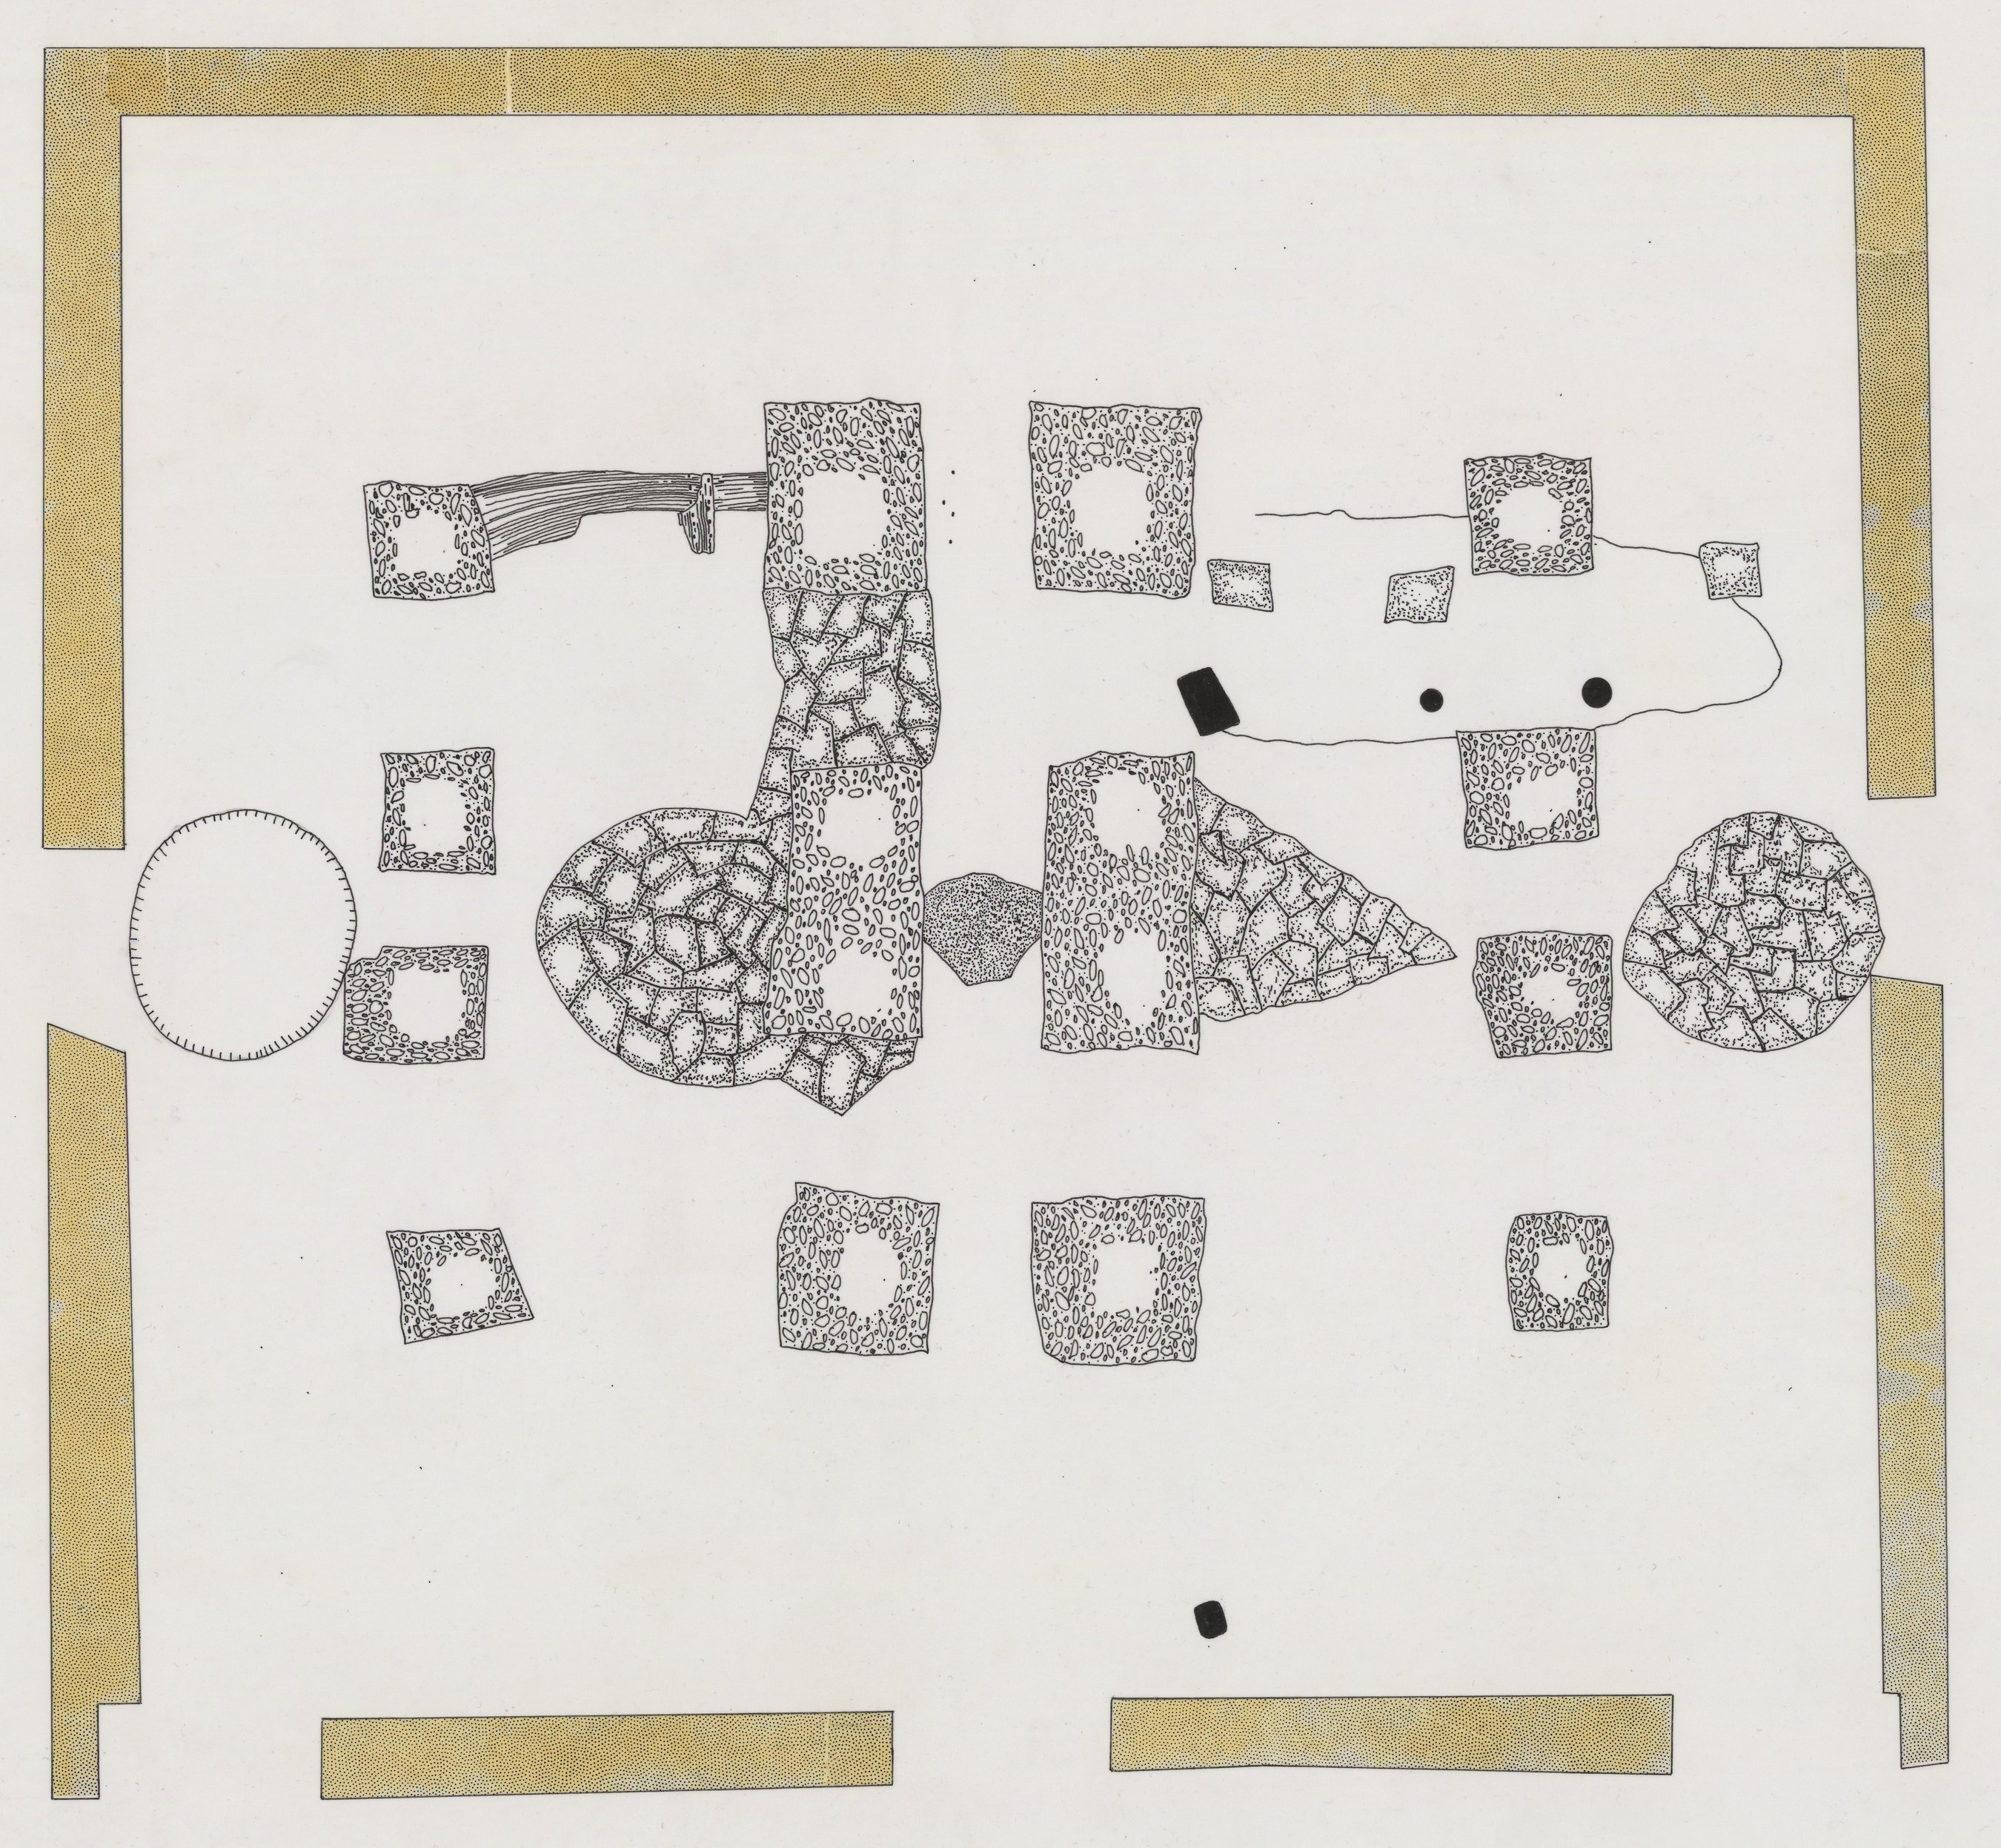 Oversized Maps of the Pottawatomi Mission, 14SH325 - 3